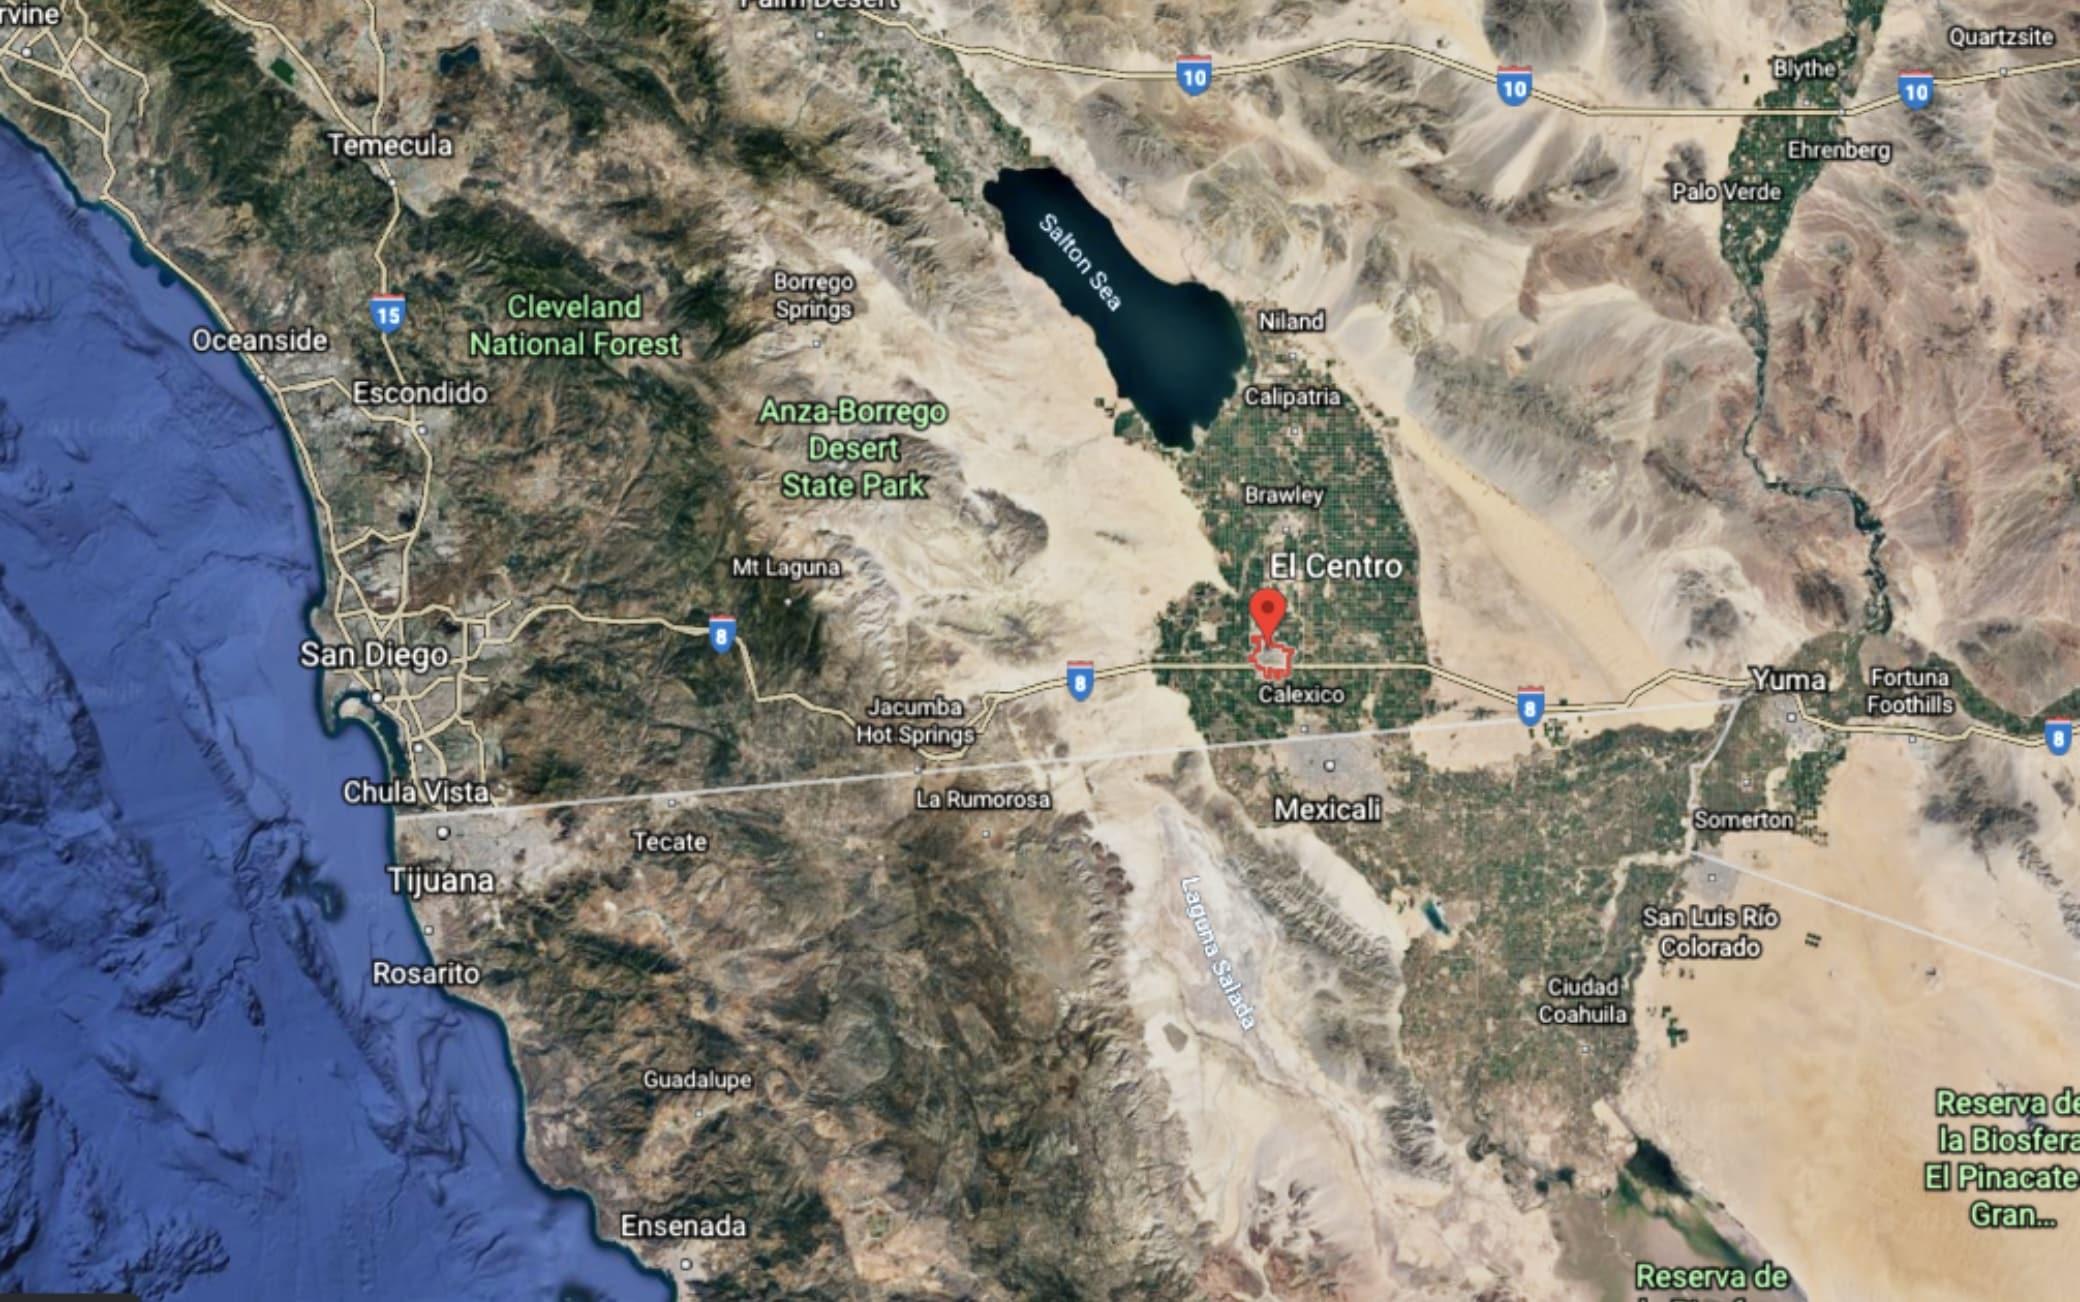 el centro california